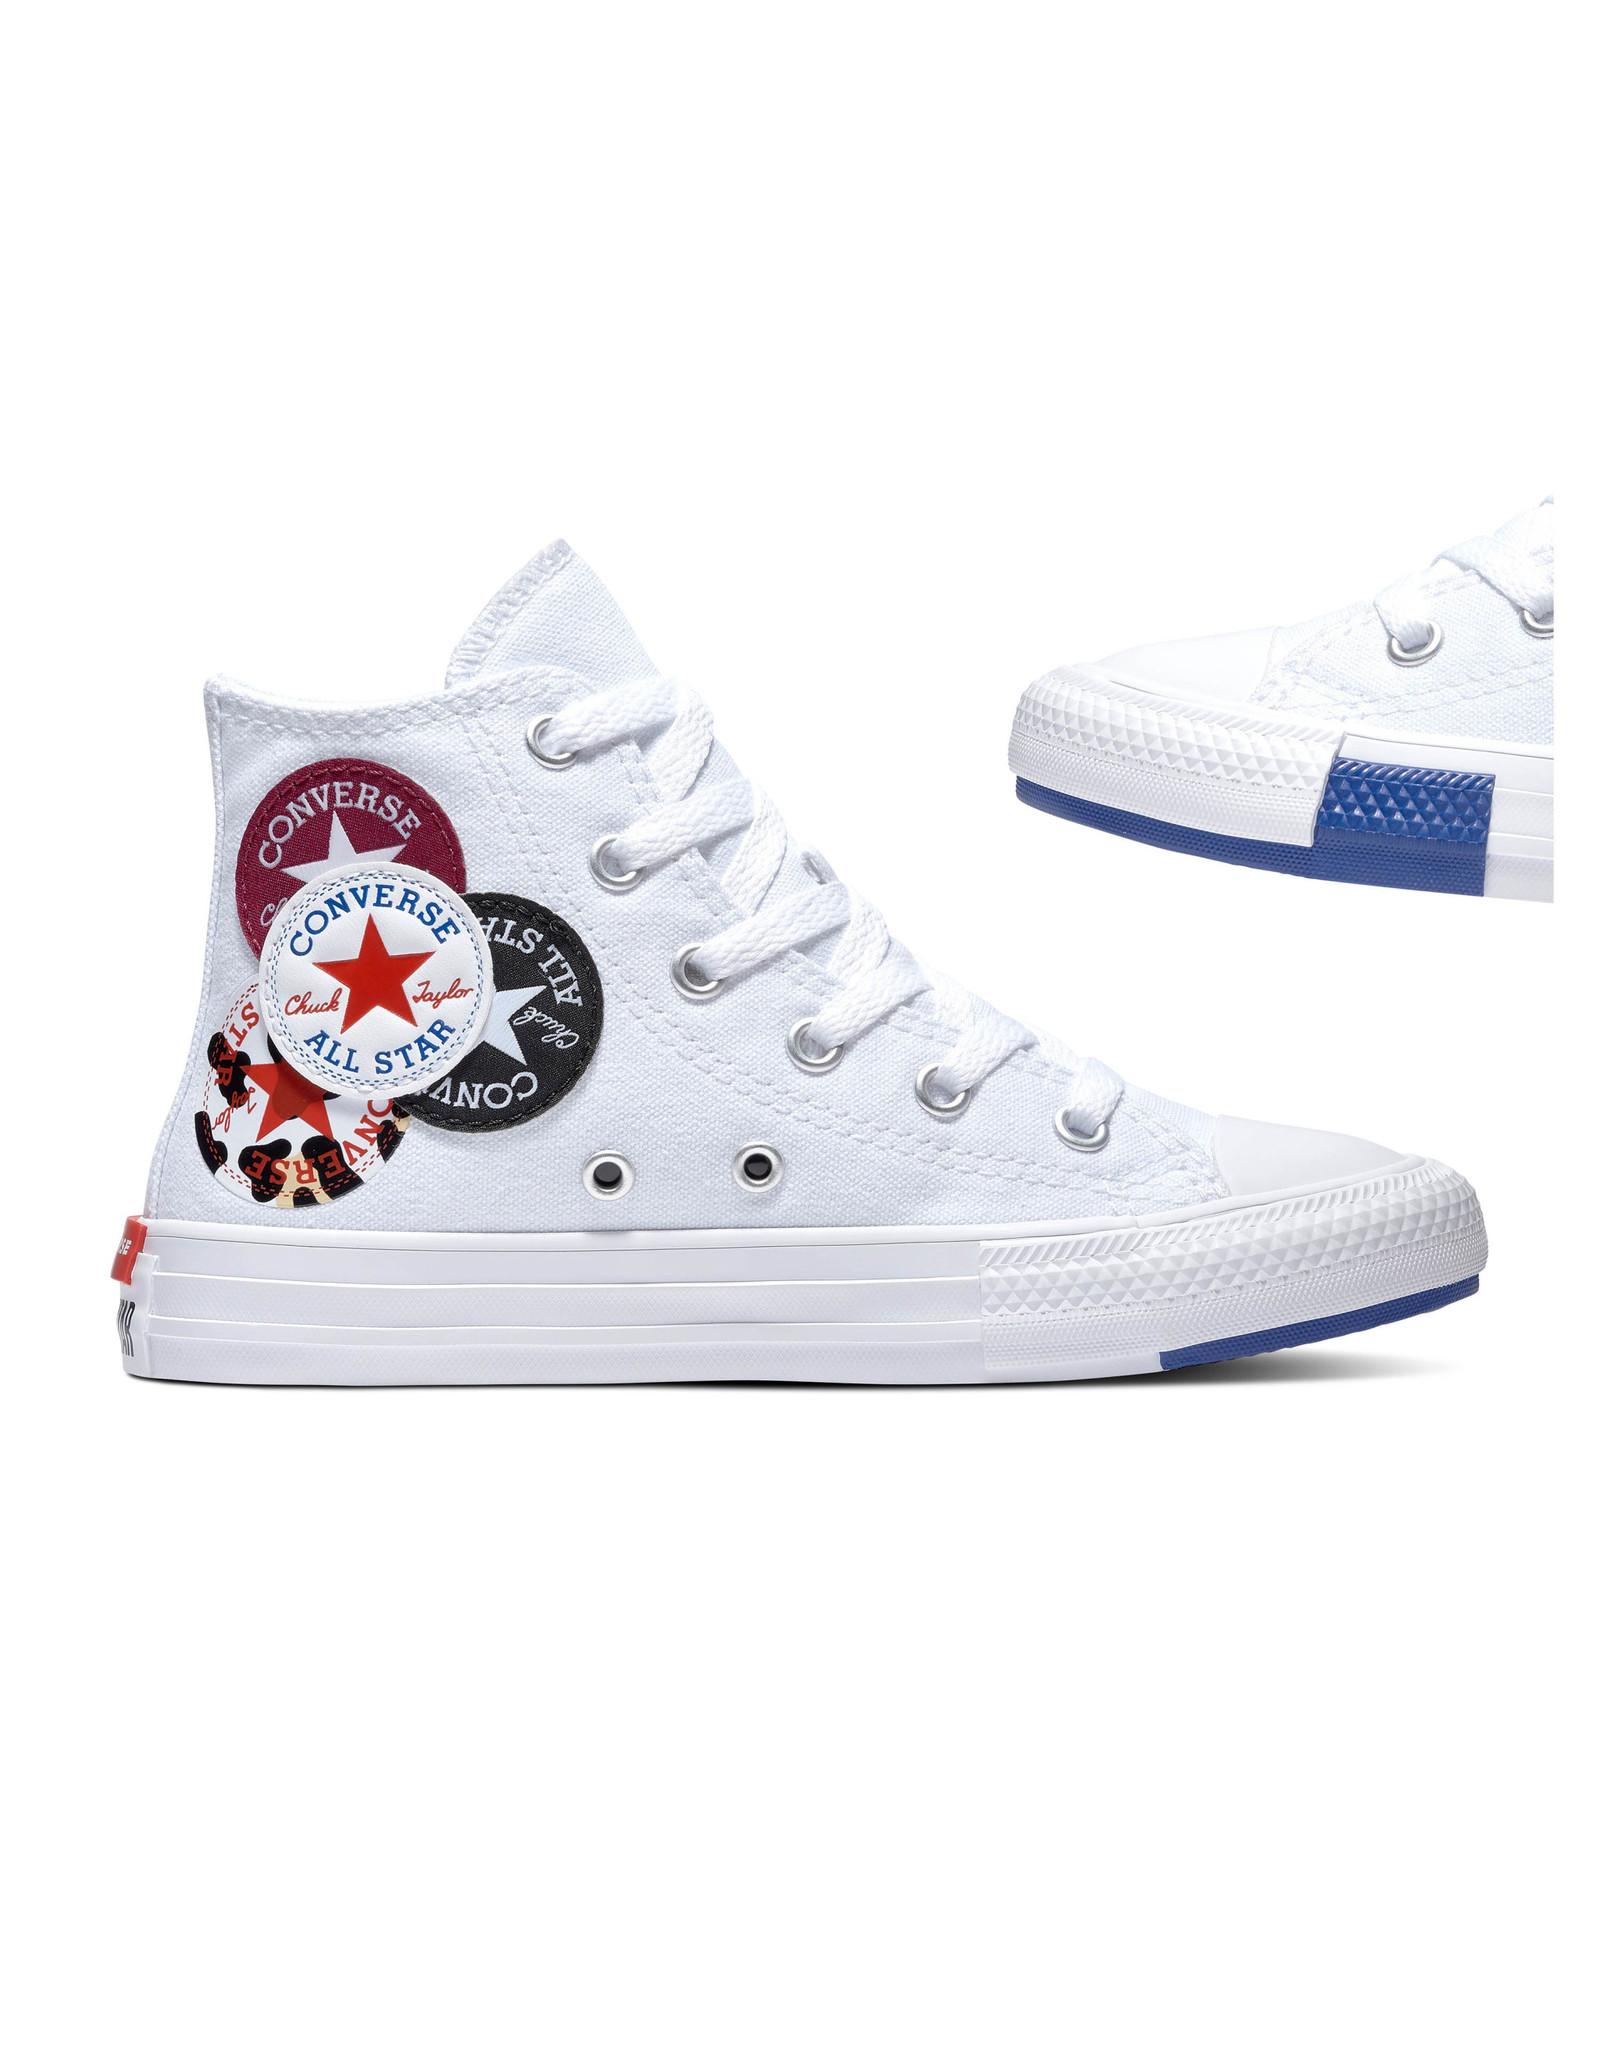 CONVERSE CHUCK TAYLOR ALL STAR  HI WHITE/RUSH BLUE/ROSE MAROON CALOW-366989C